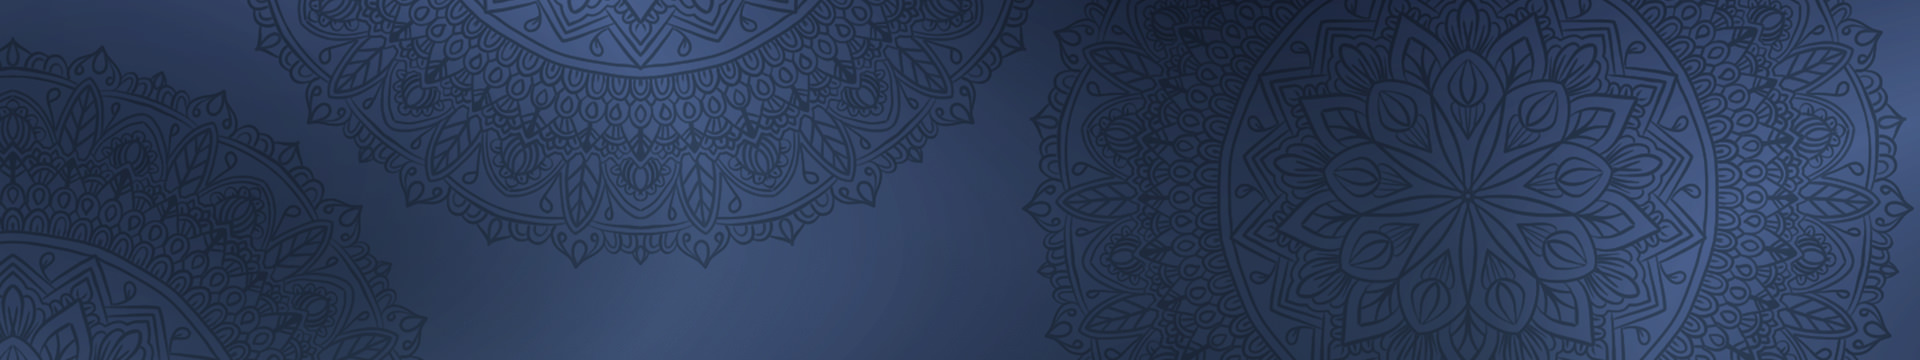 team-banner-image